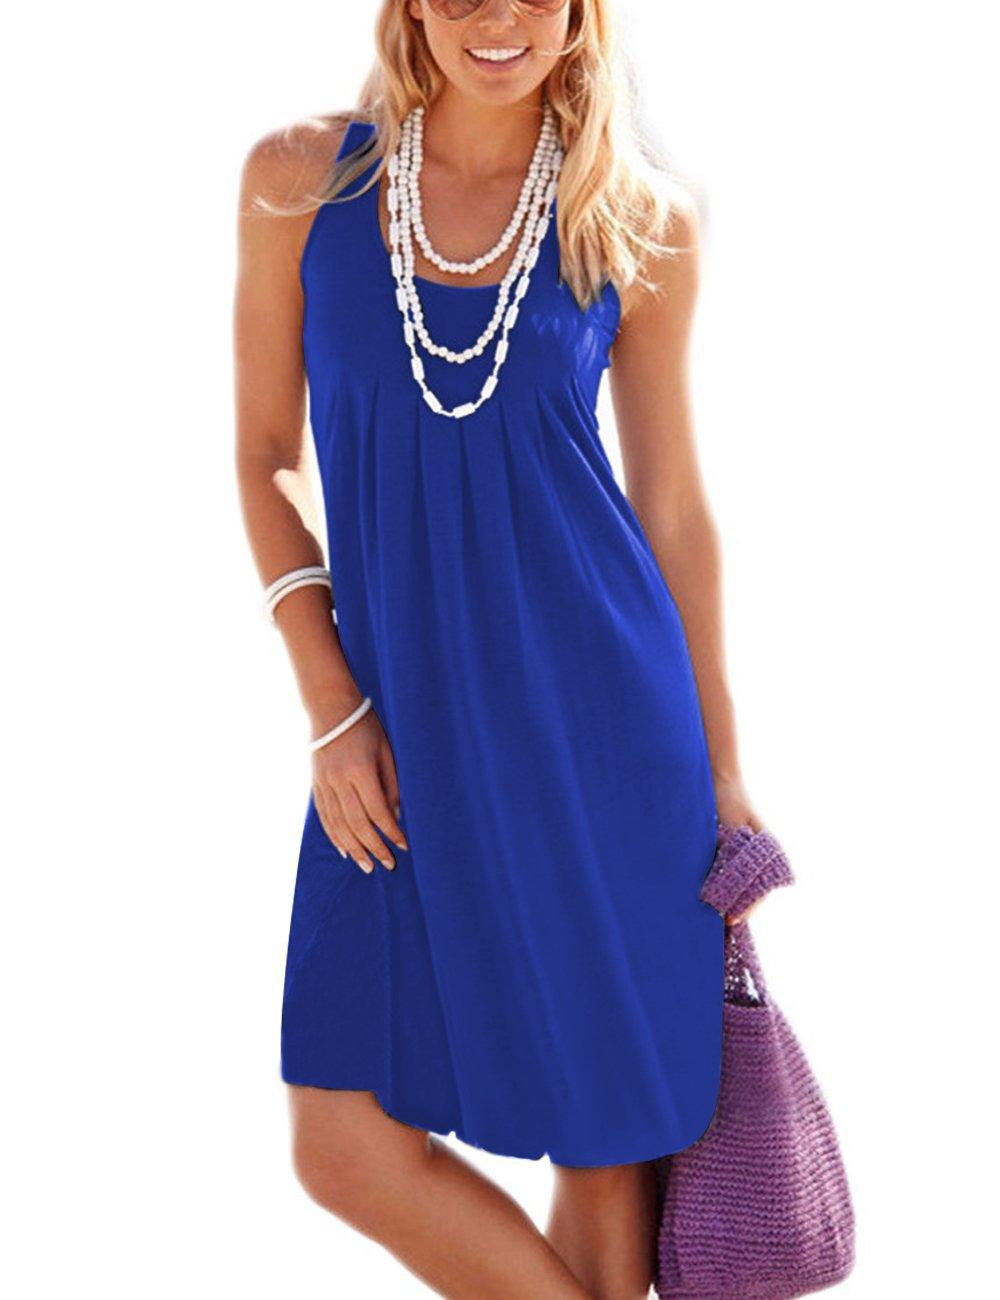 Traleubie Women's Casual Summer Tank Sleeveless Knee Length Vest Pleated Sun Dresses Royal Blue M